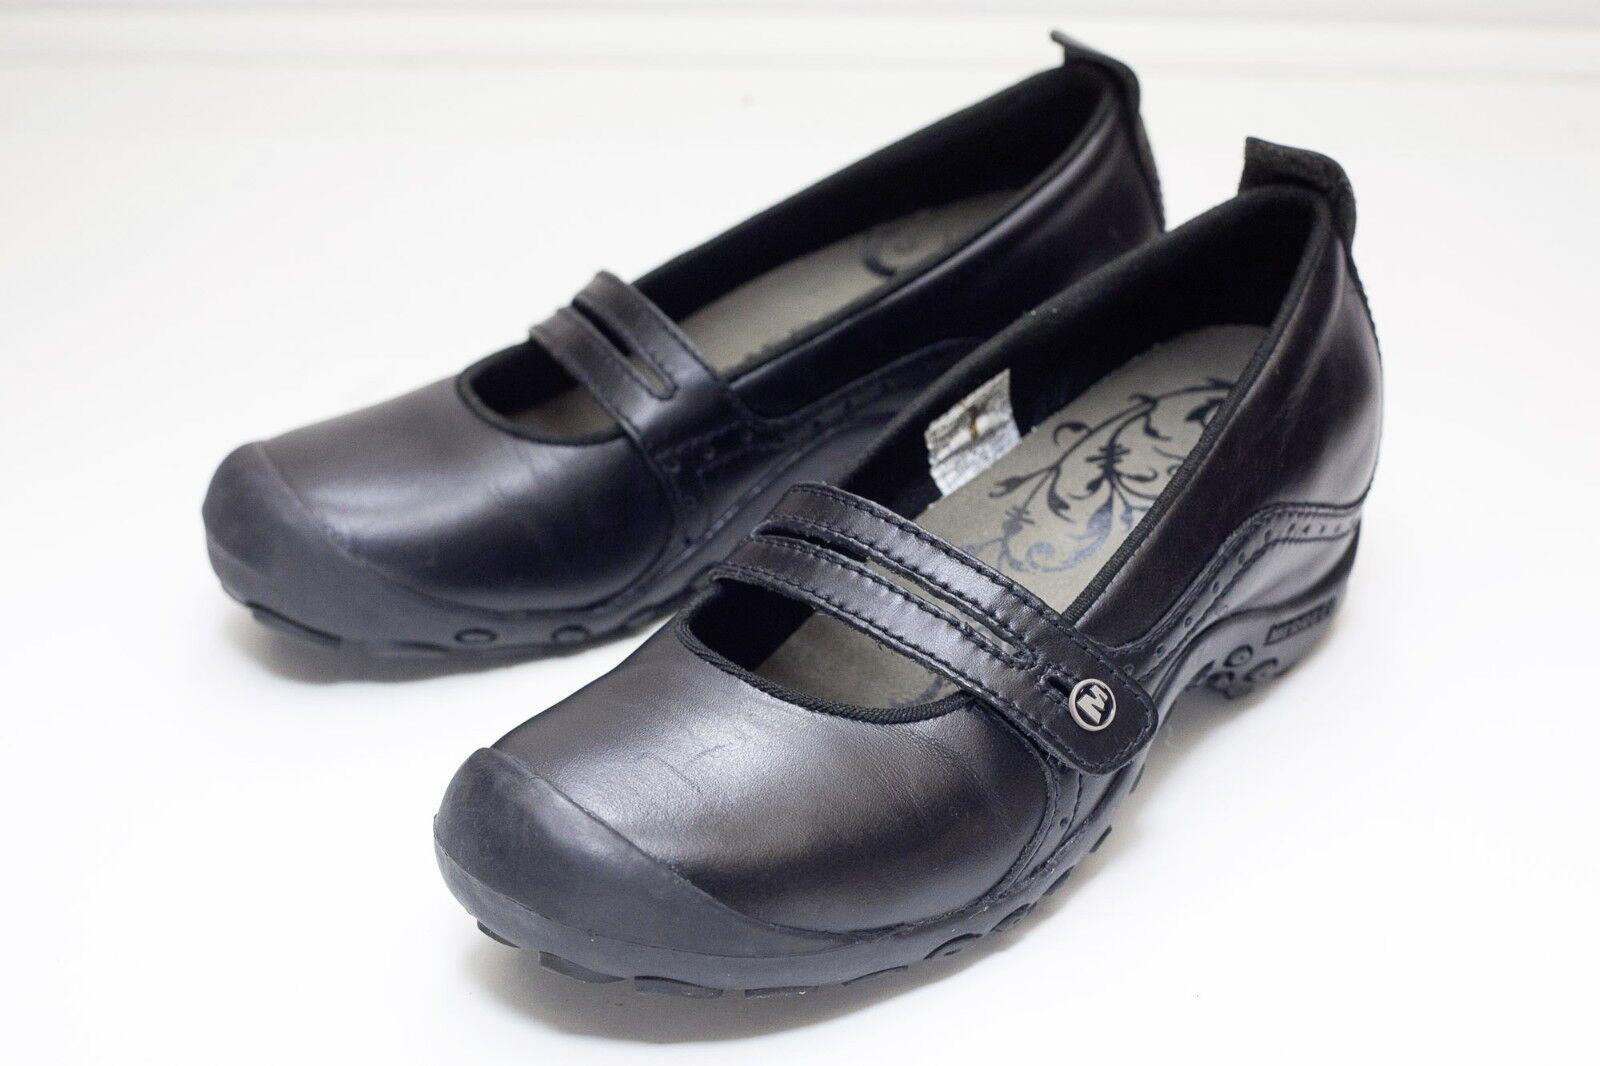 Merrell 7 Black Mary Jane Women's shoes